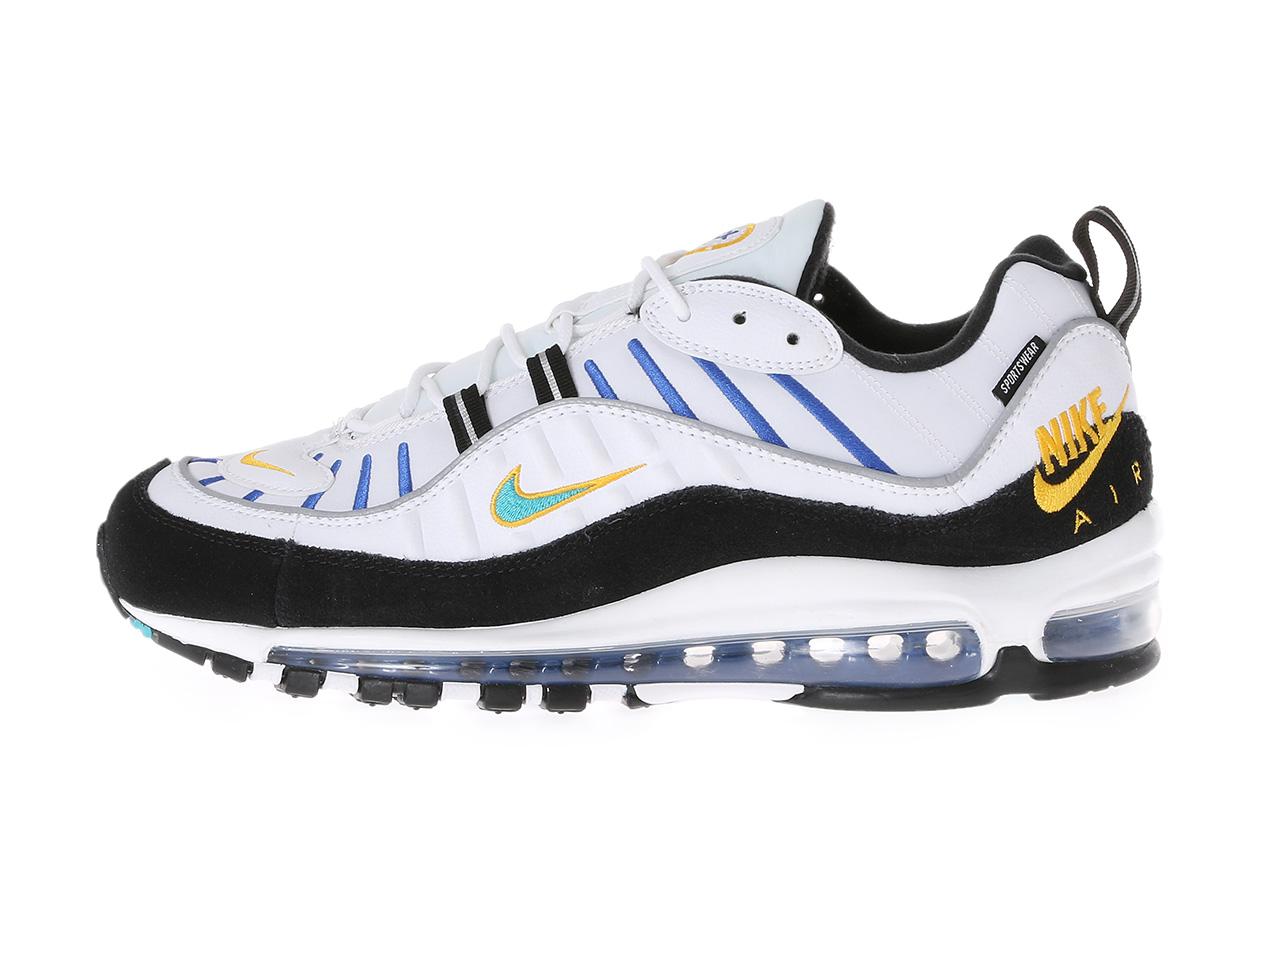 【OUTLET特価】NIKE AIR MAX 98 PRM(BV0989-102)【ナイキ】【シューズ】【スニーカー】【靴】【フットウェア】